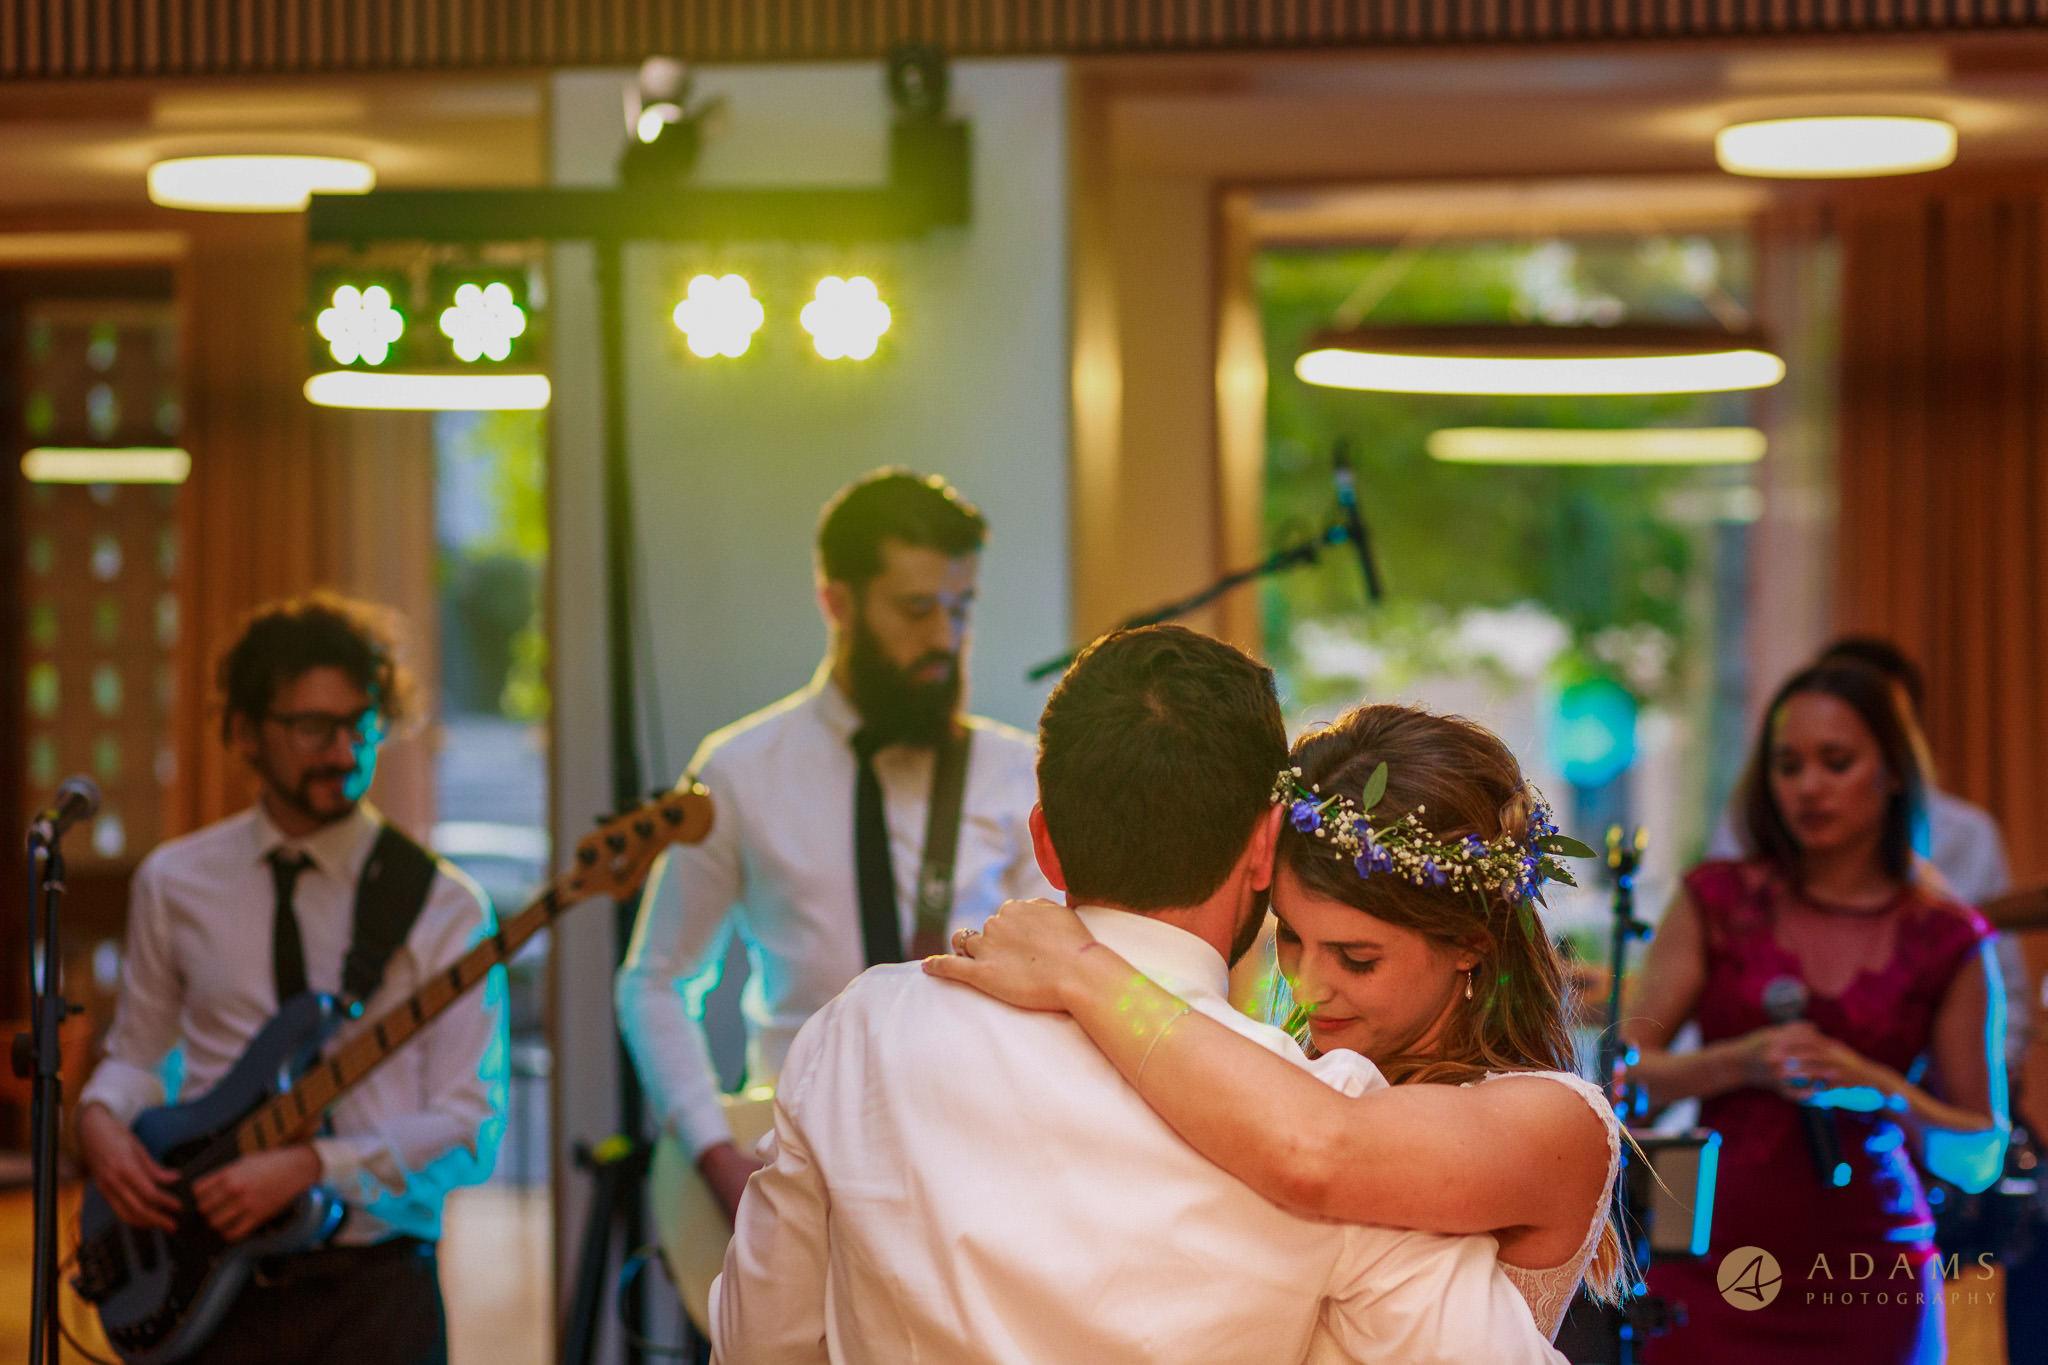 Wedding photographer Cambridge first dance